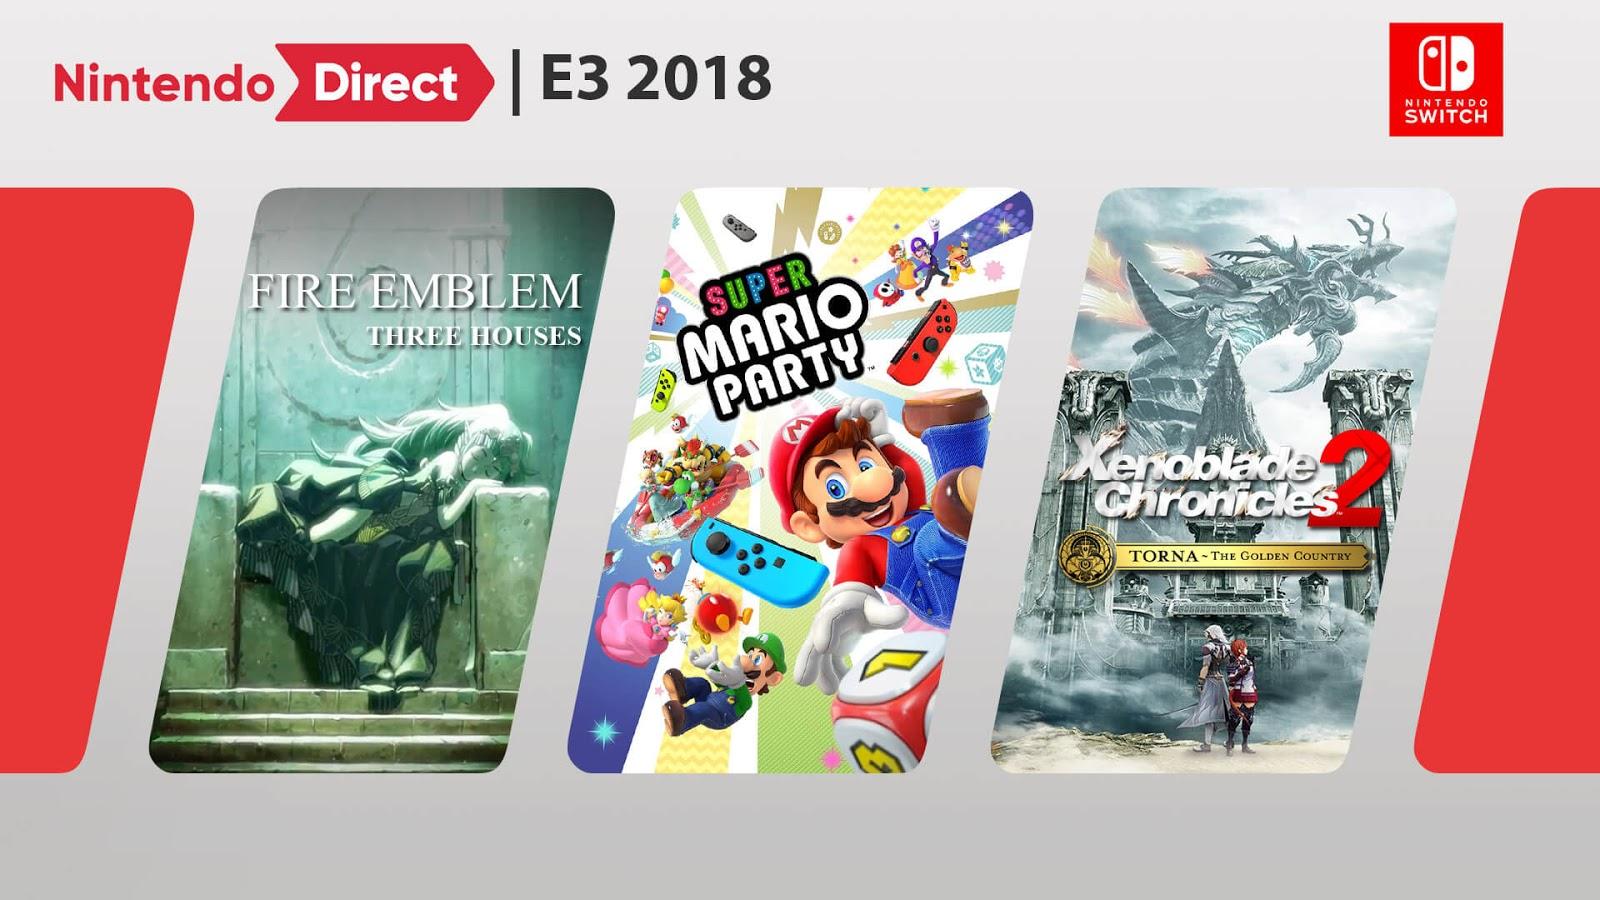 Nintendo Direct E3 2018 - Gameslaught